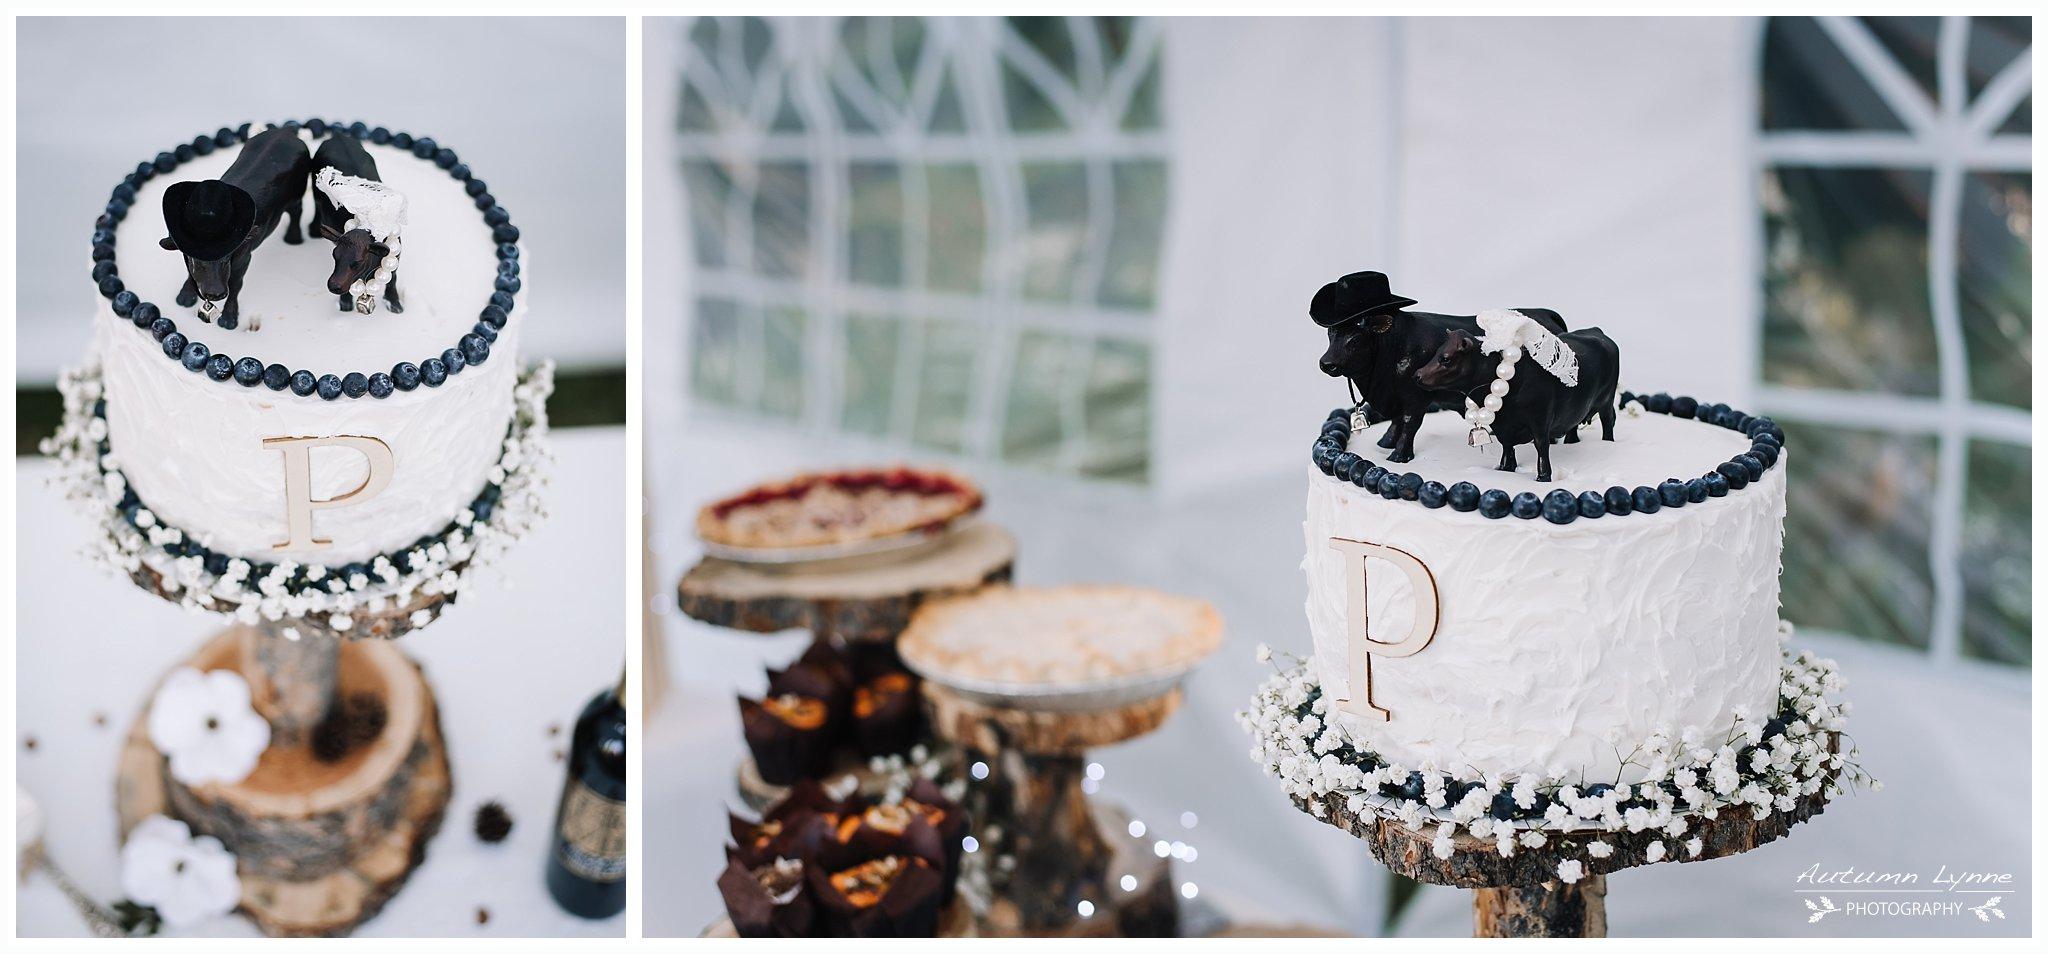 wedding cake details. Cow cake topper with blueberry edging. Country wedding cake.Idaho wedding photographers